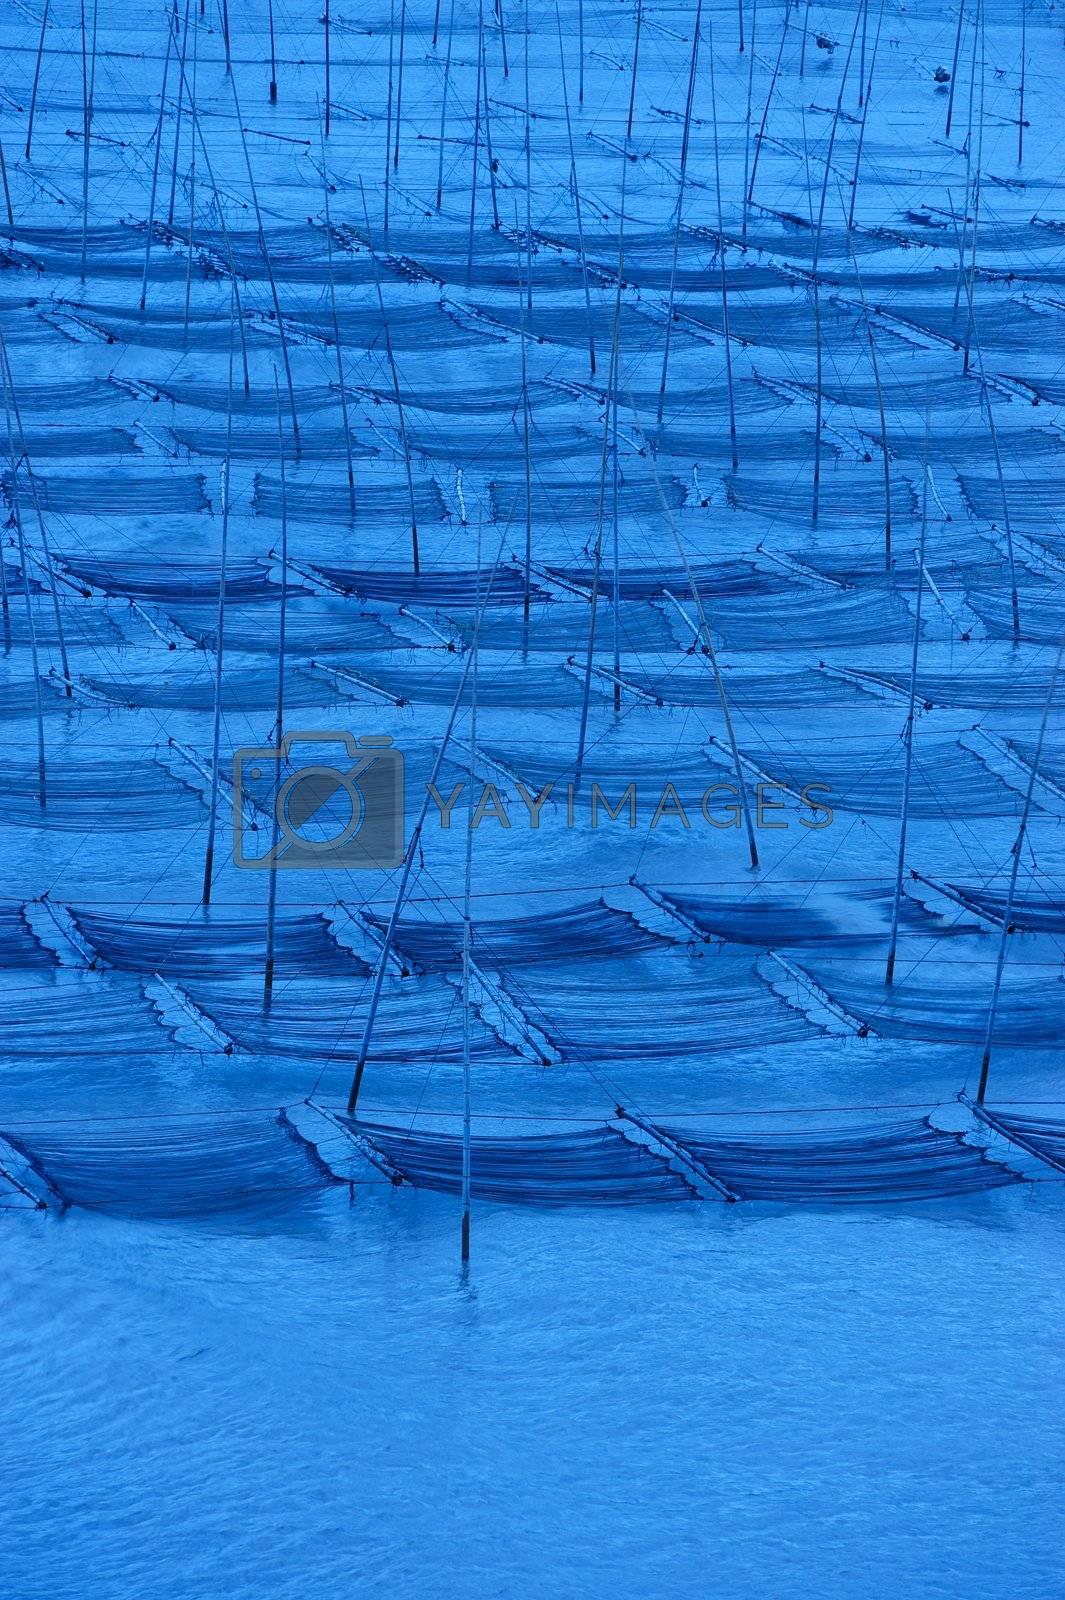 Seaweed farm at dawn, photo taken in Fujian province of China